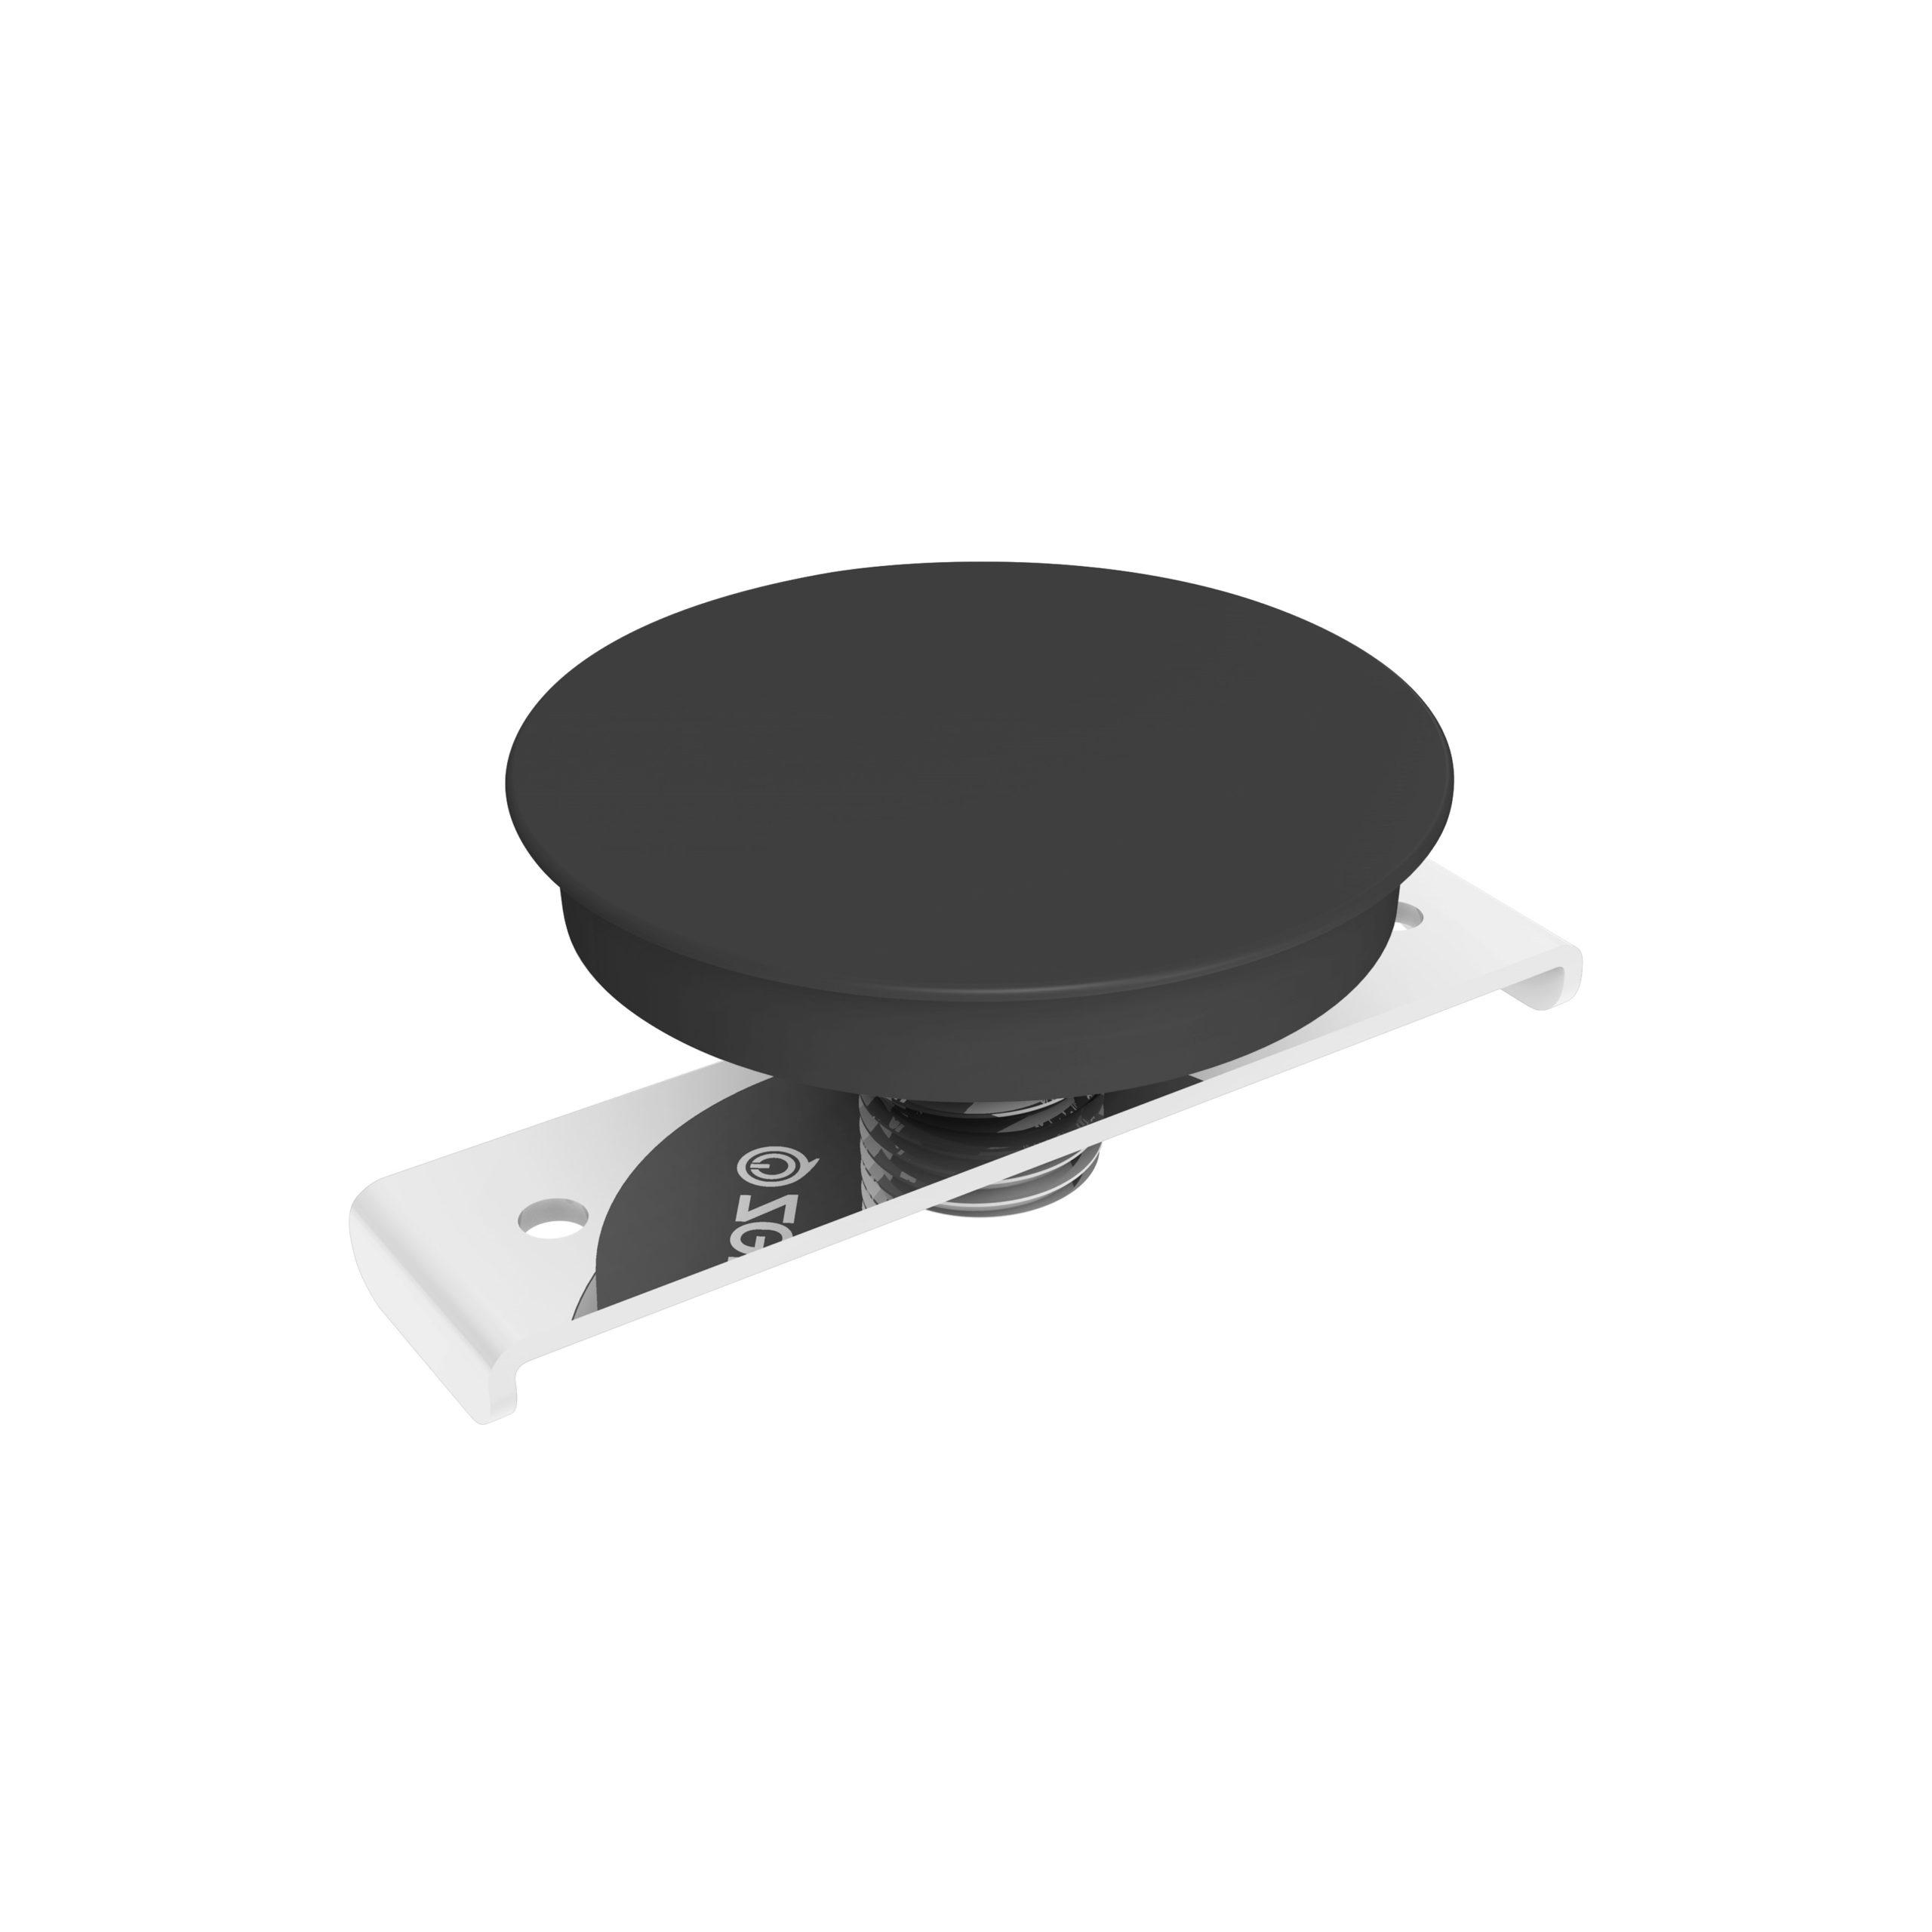 ZEBI01B/00 - Zens Built-in wireless charger round black 3D view